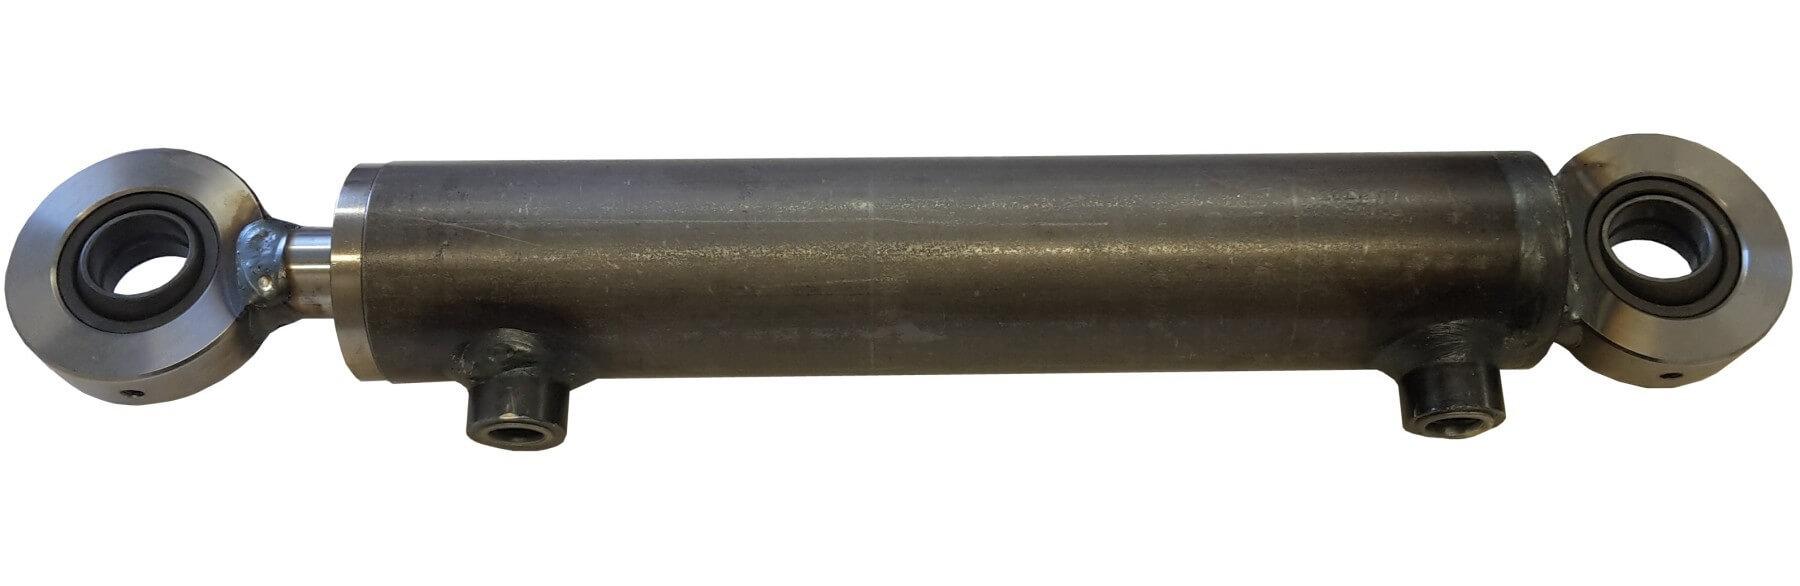 Hydraulisylinteri CL 50. 25. 450 GE